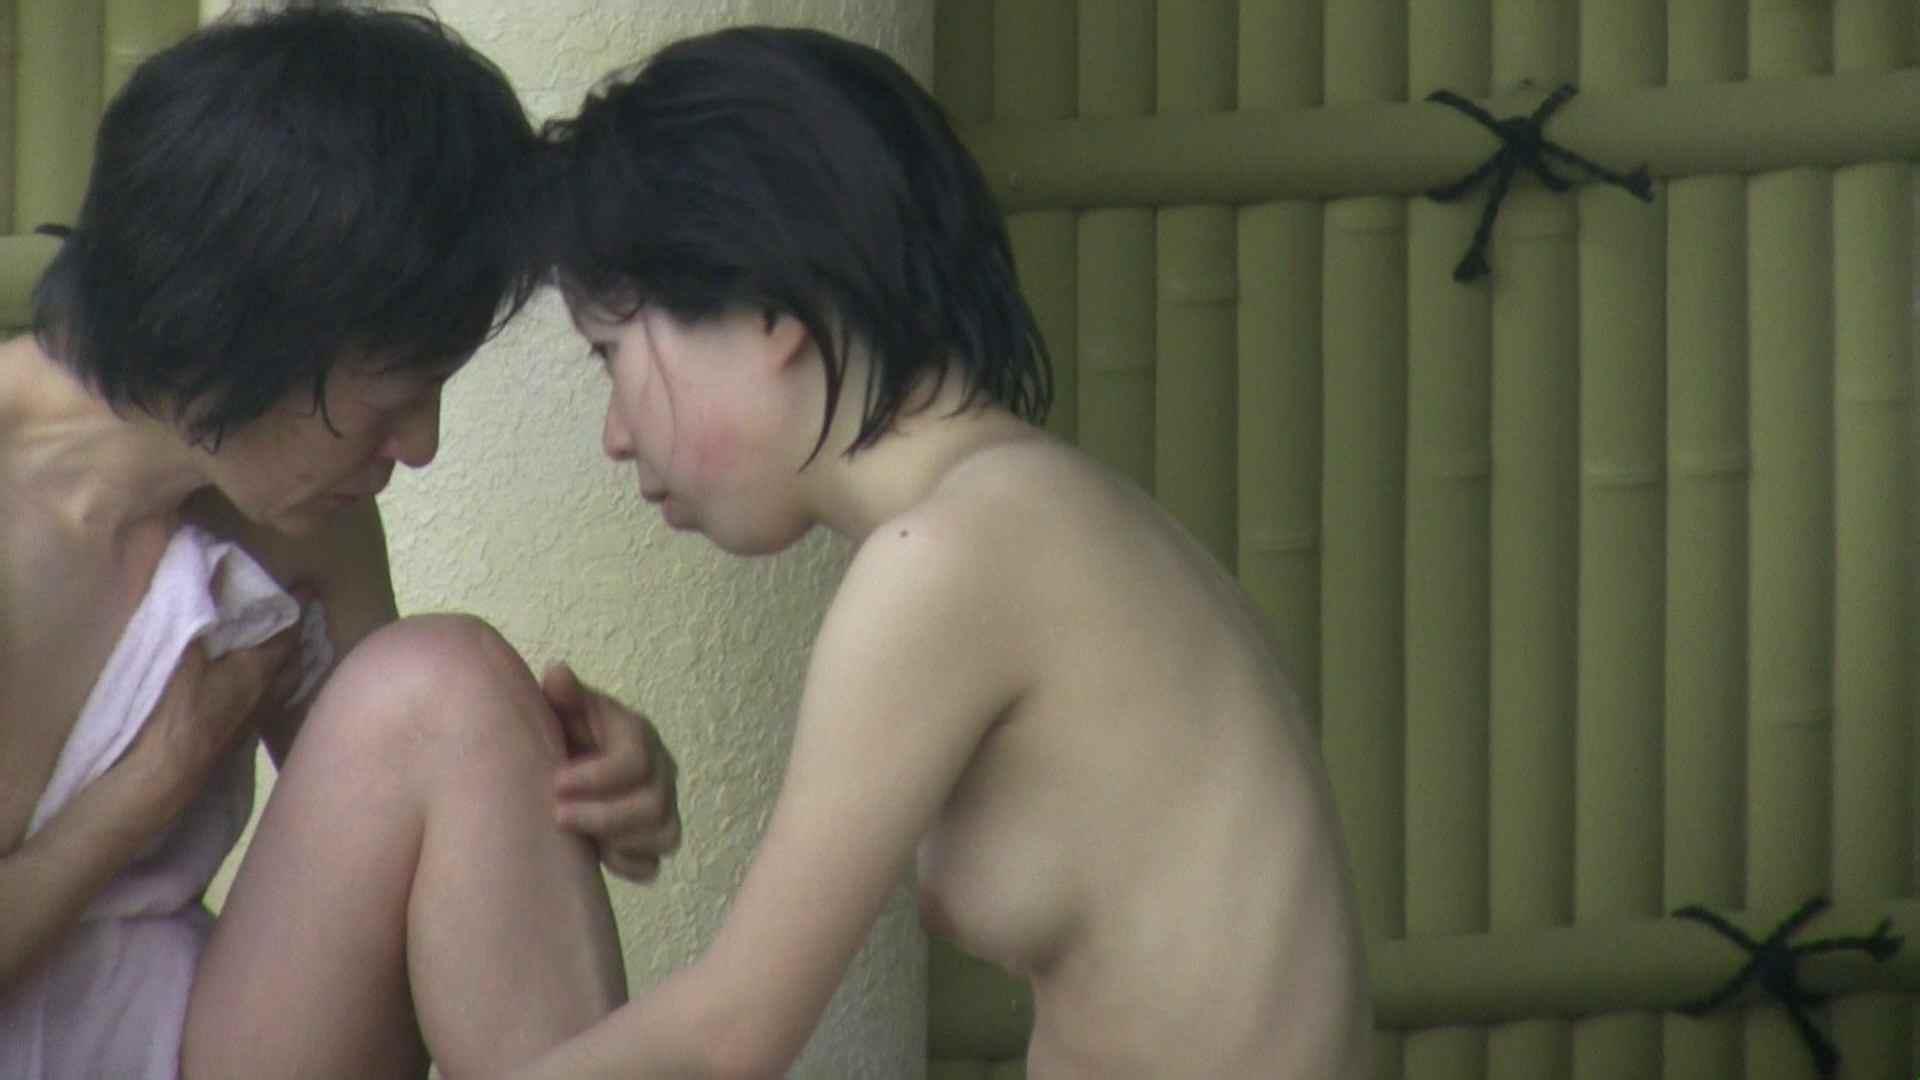 Aquaな露天風呂Vol.06【VIP】 盗撮 | OLエロ画像  113PICs 22